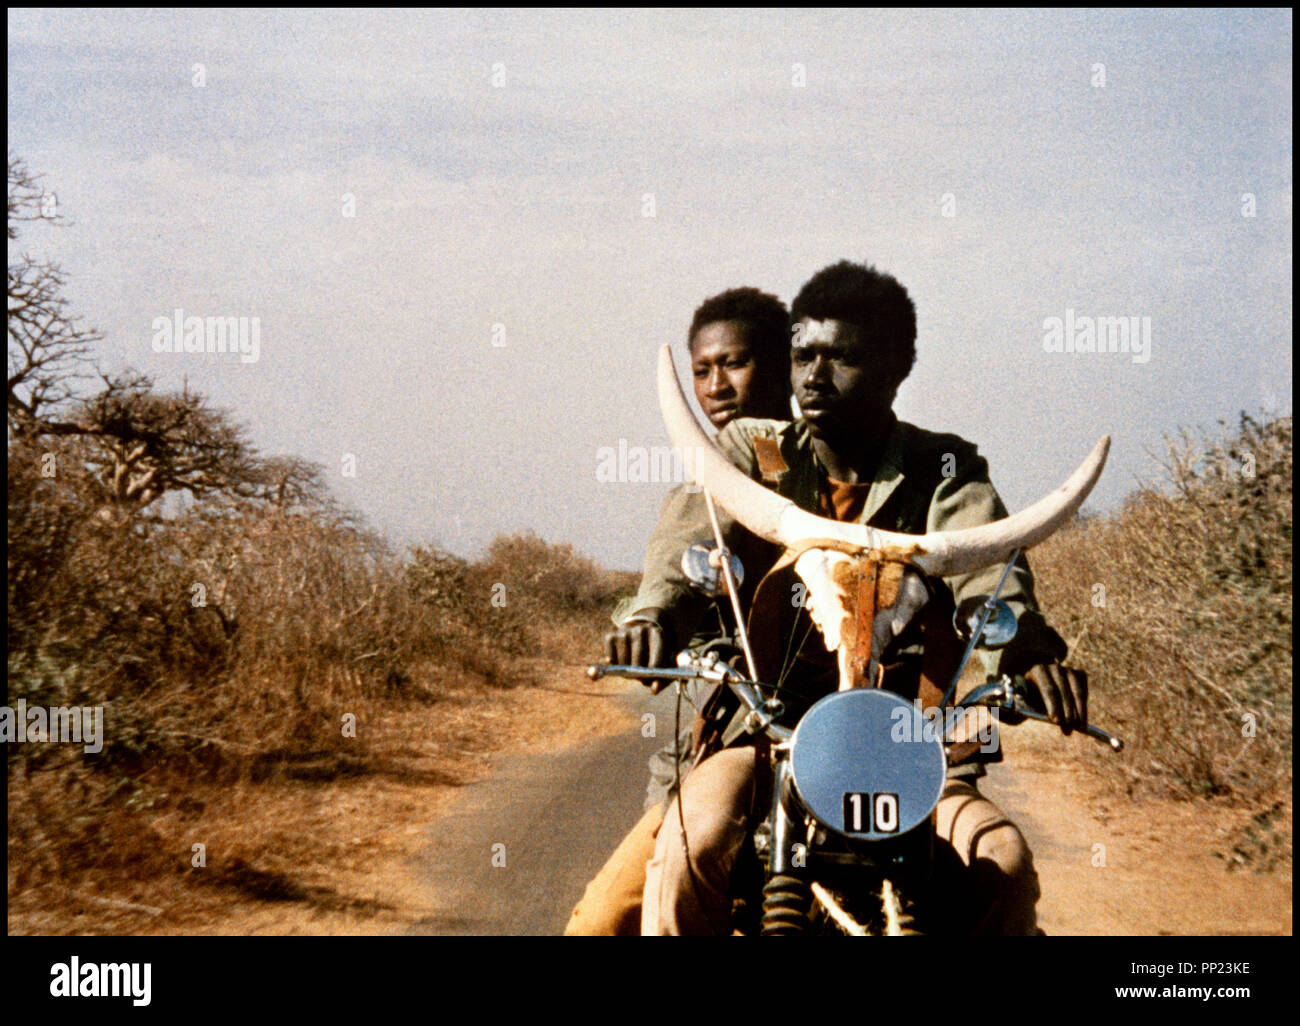 Prod DB © Cinegrit - Studio Kankourama / DR TOUKI-BOUKI (TOUKI BOUKI) de Djibril Diop Mambety 1973 SENEGAL avec Mareme Niang et Magaye Niang moto, brousse, couple, cornes, crane autre titre: Le Voyage de la hyene, Journey of the HyenaStock Photo